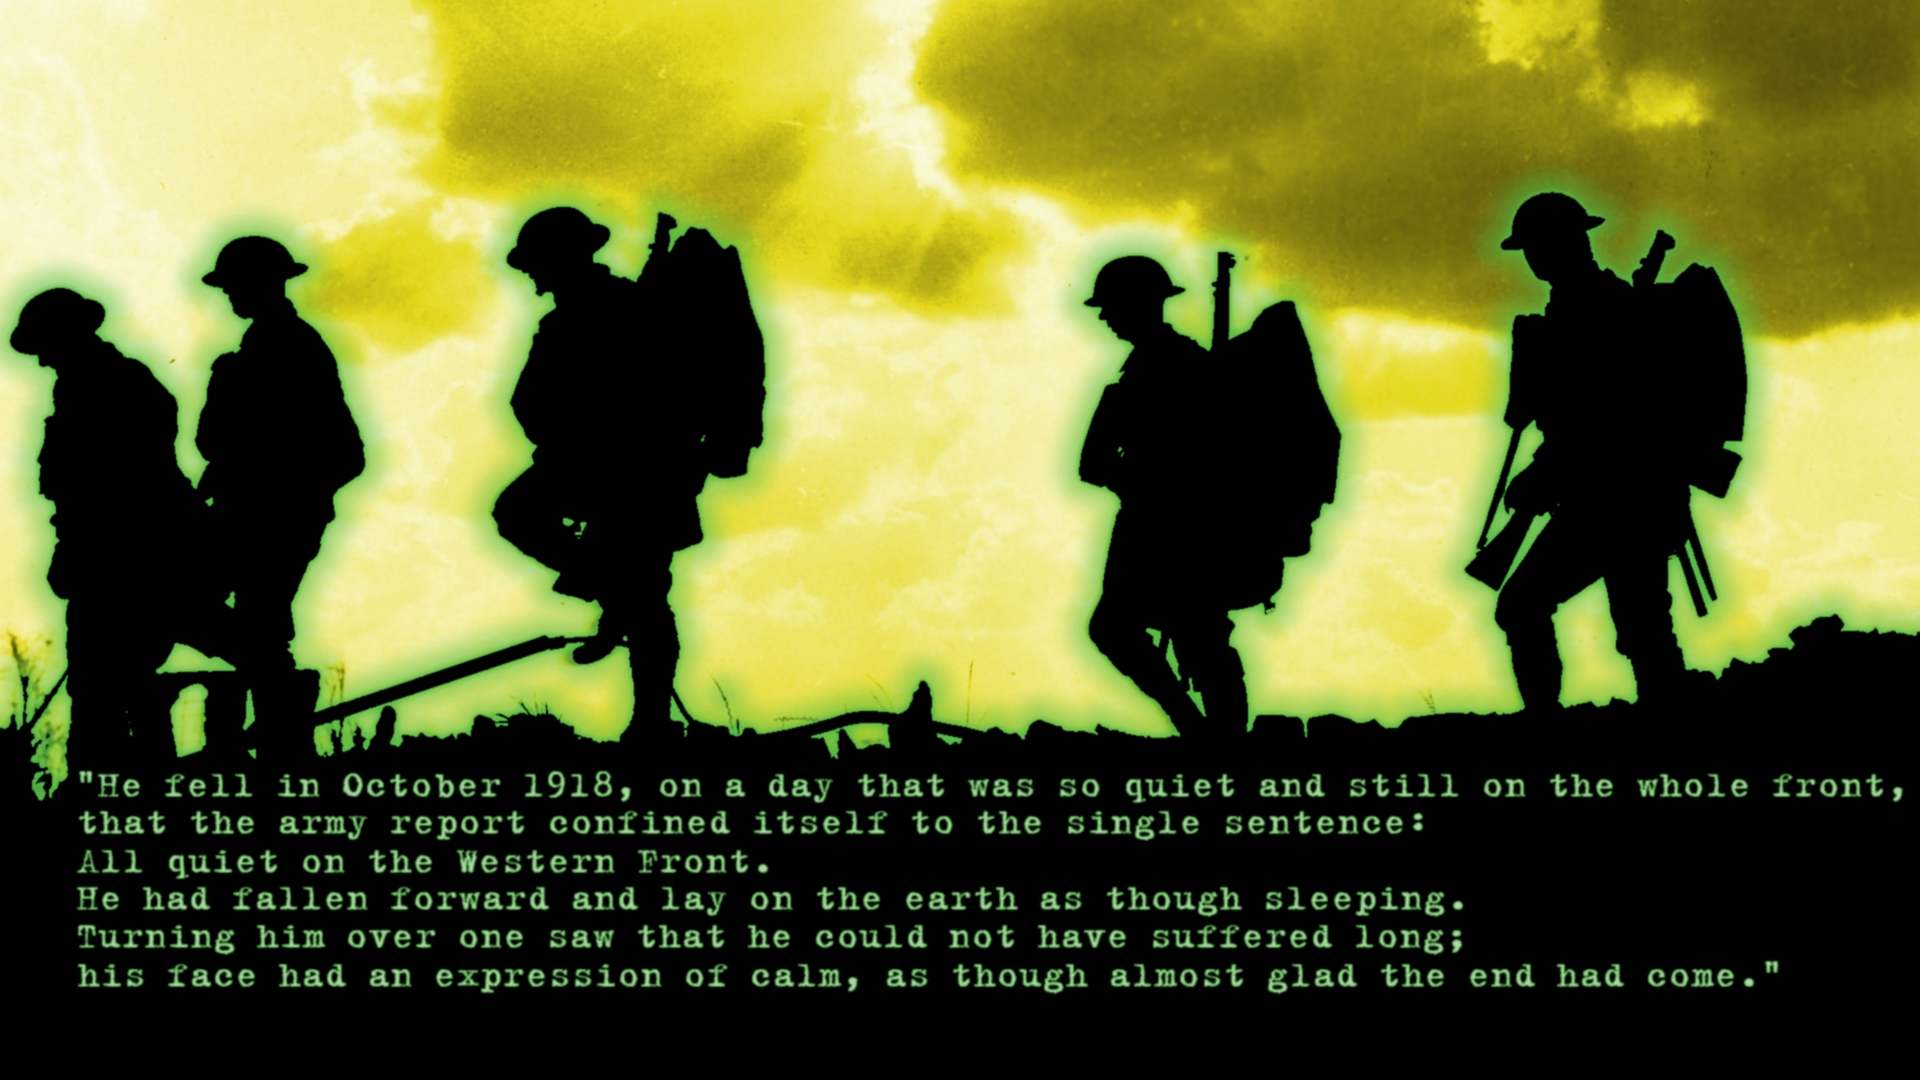 Erich Maria Remarque's quote #1